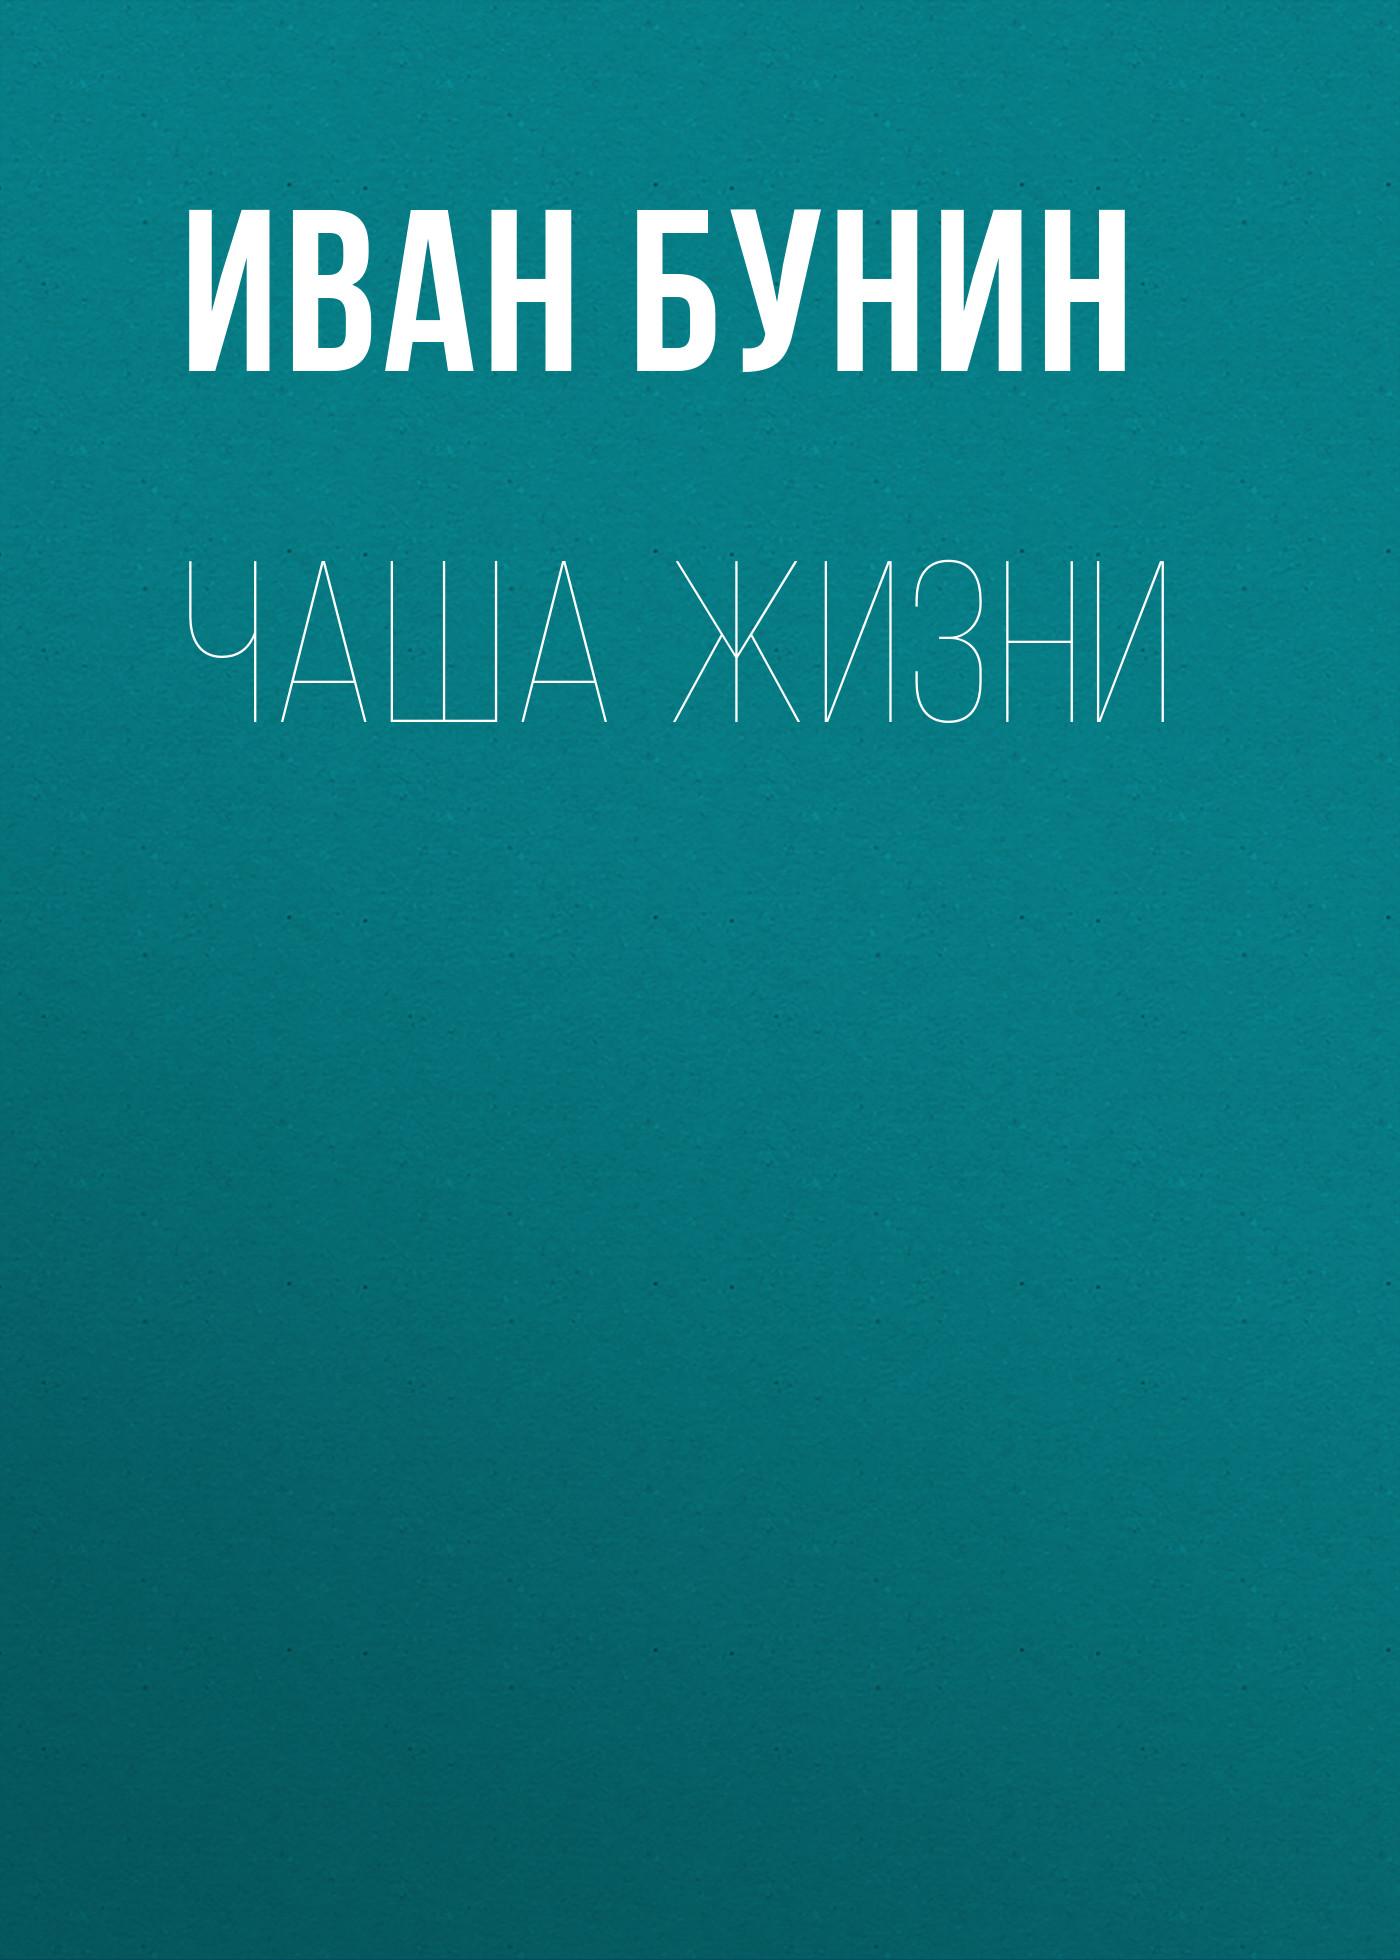 Купить книгу Чаша жизни, автора Ивана Бунина